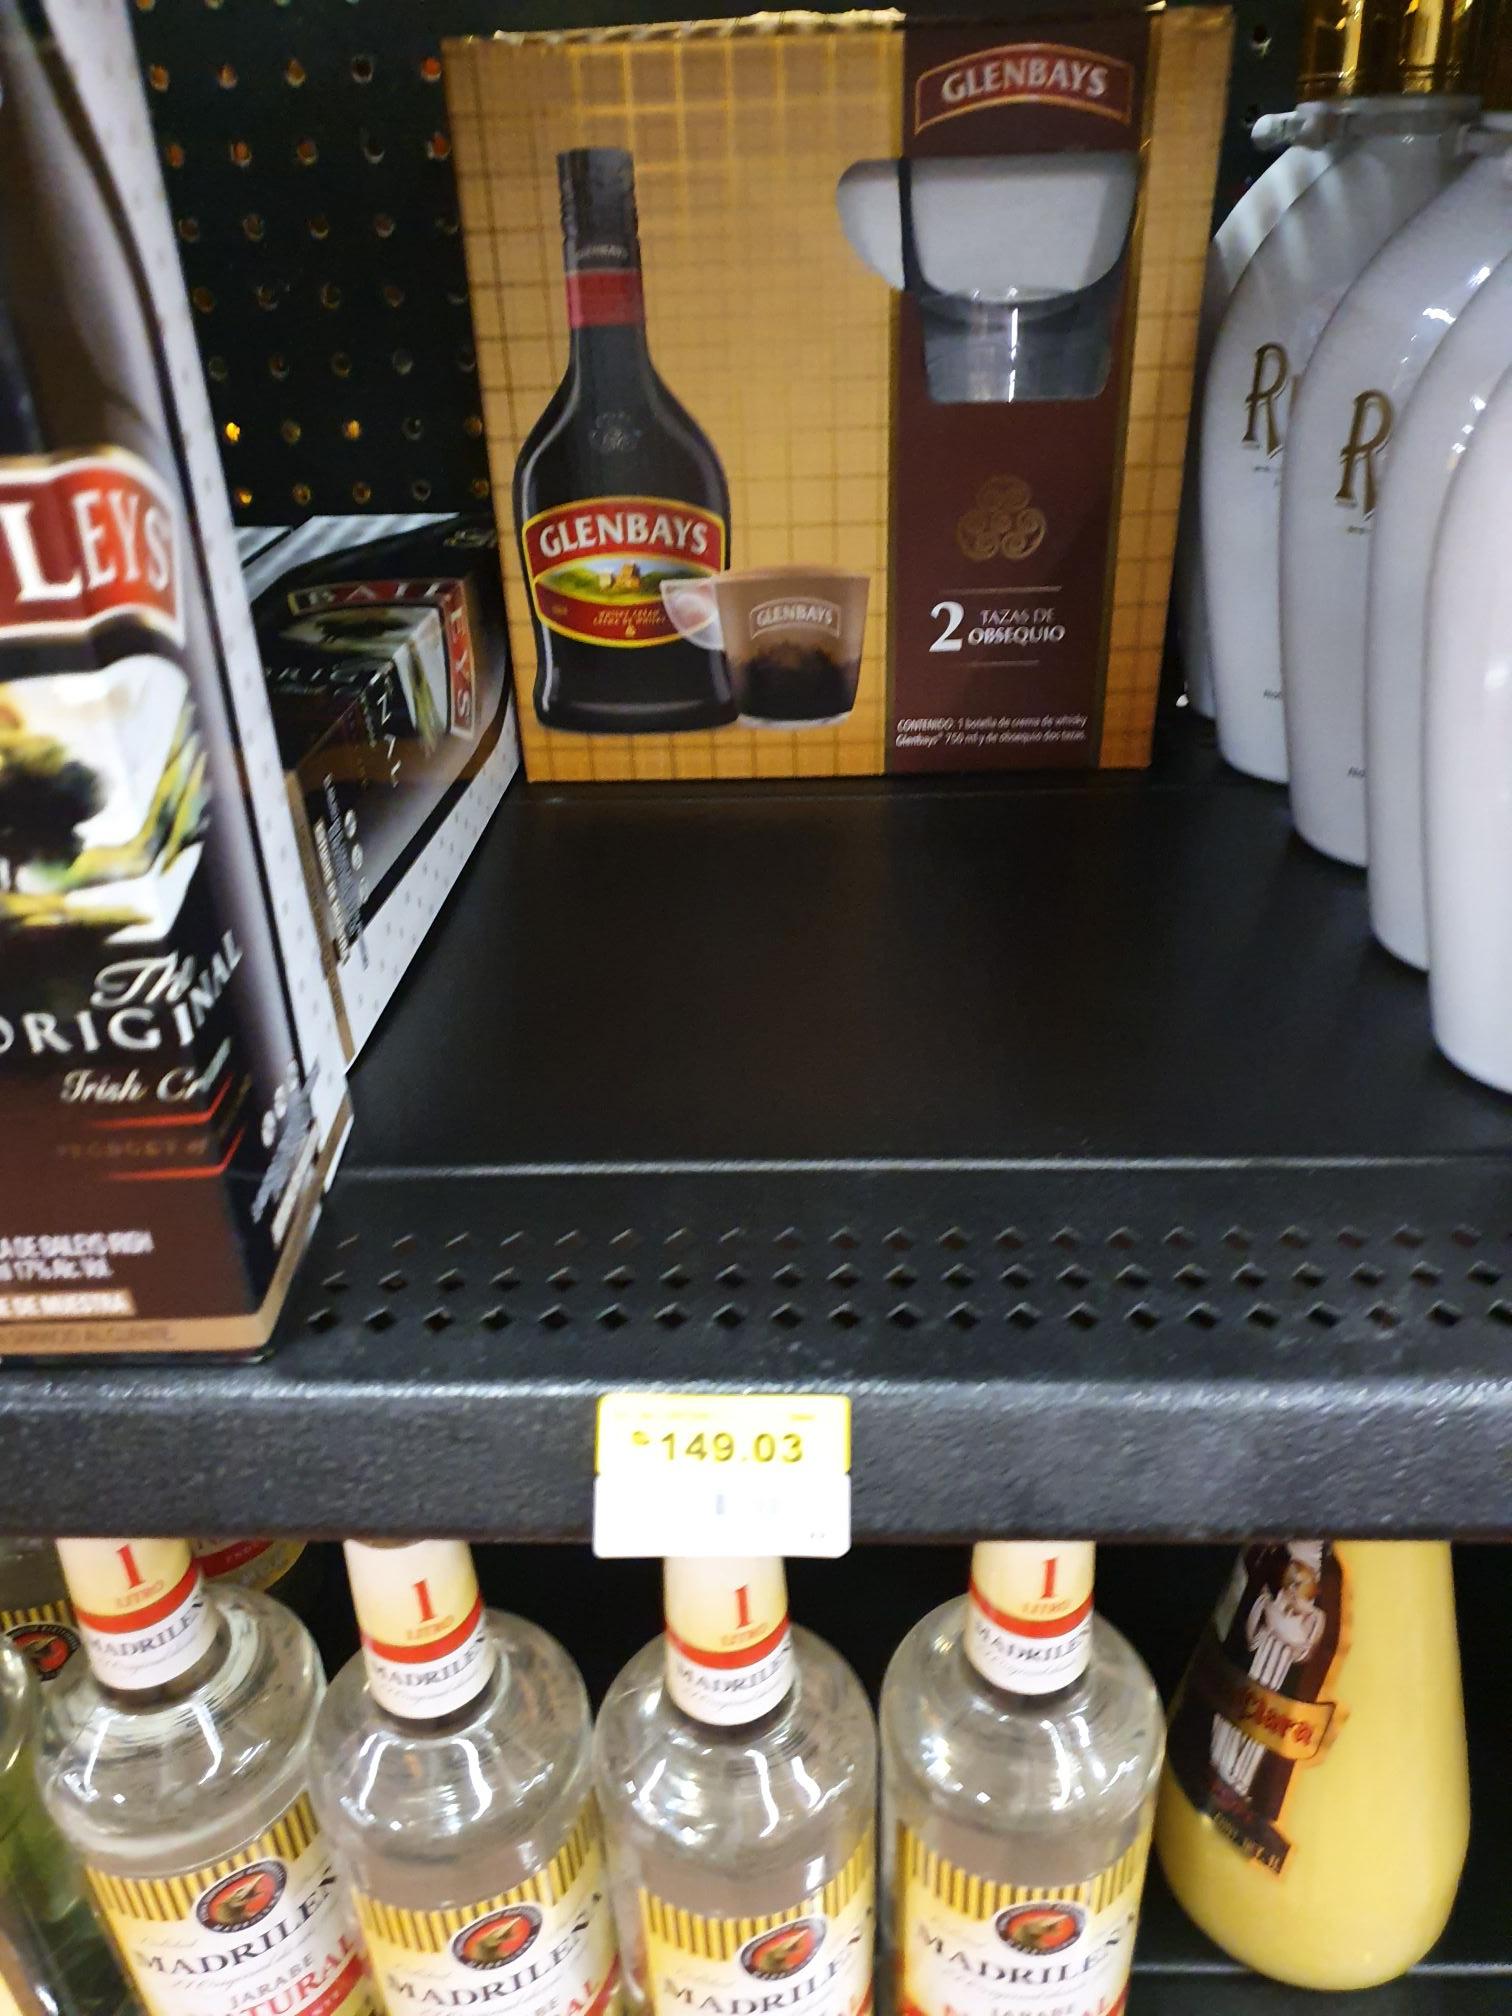 Walmart SLP: Glenbays